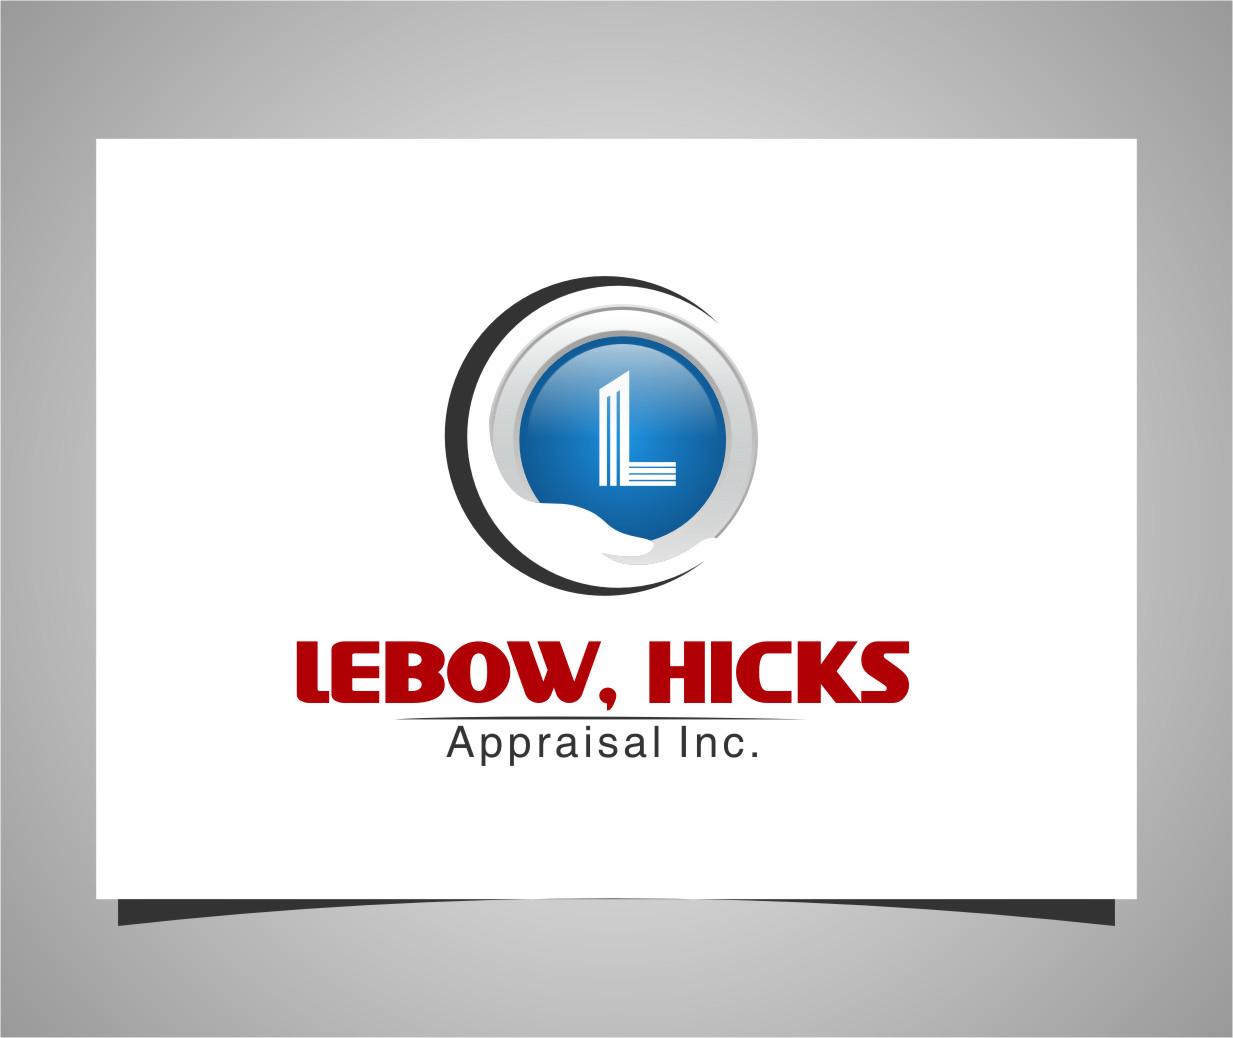 Logo Design by Ngepet_art - Entry No. 120 in the Logo Design Contest Fun Logo Design for Lebow, Hicks Appraisal Inc..